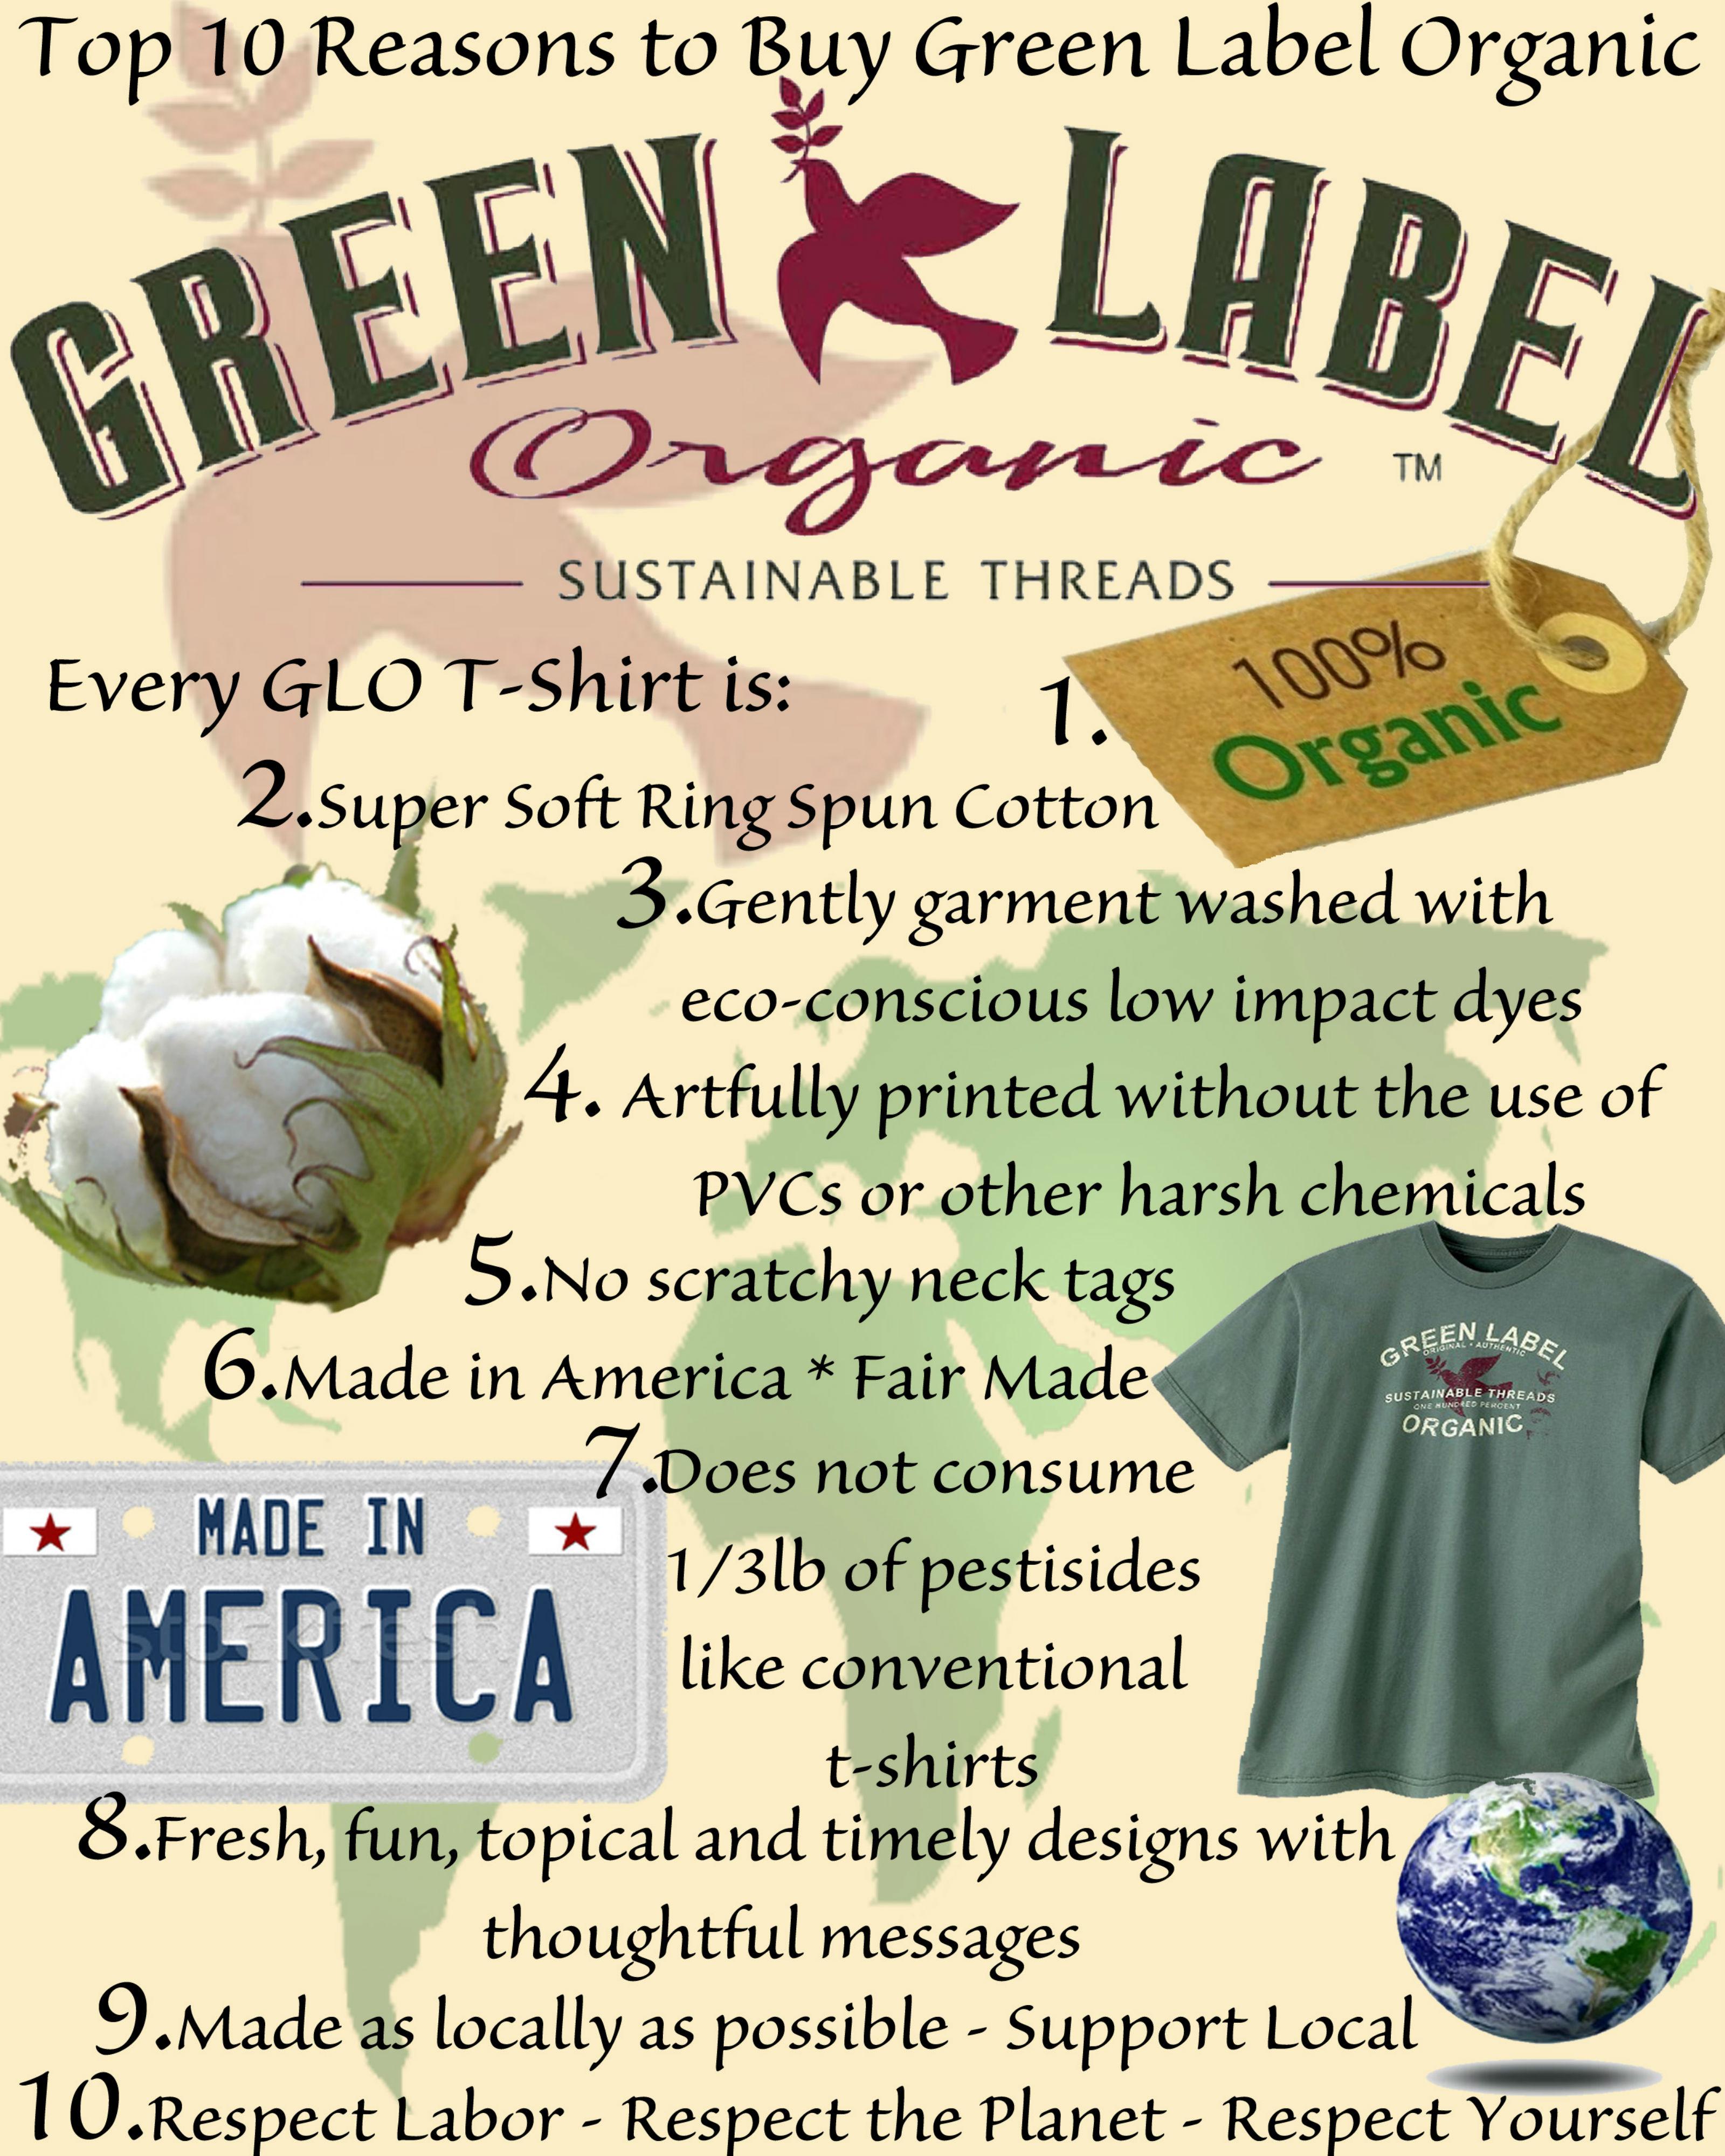 Top 10 Reasons to Buy Green Label Organic